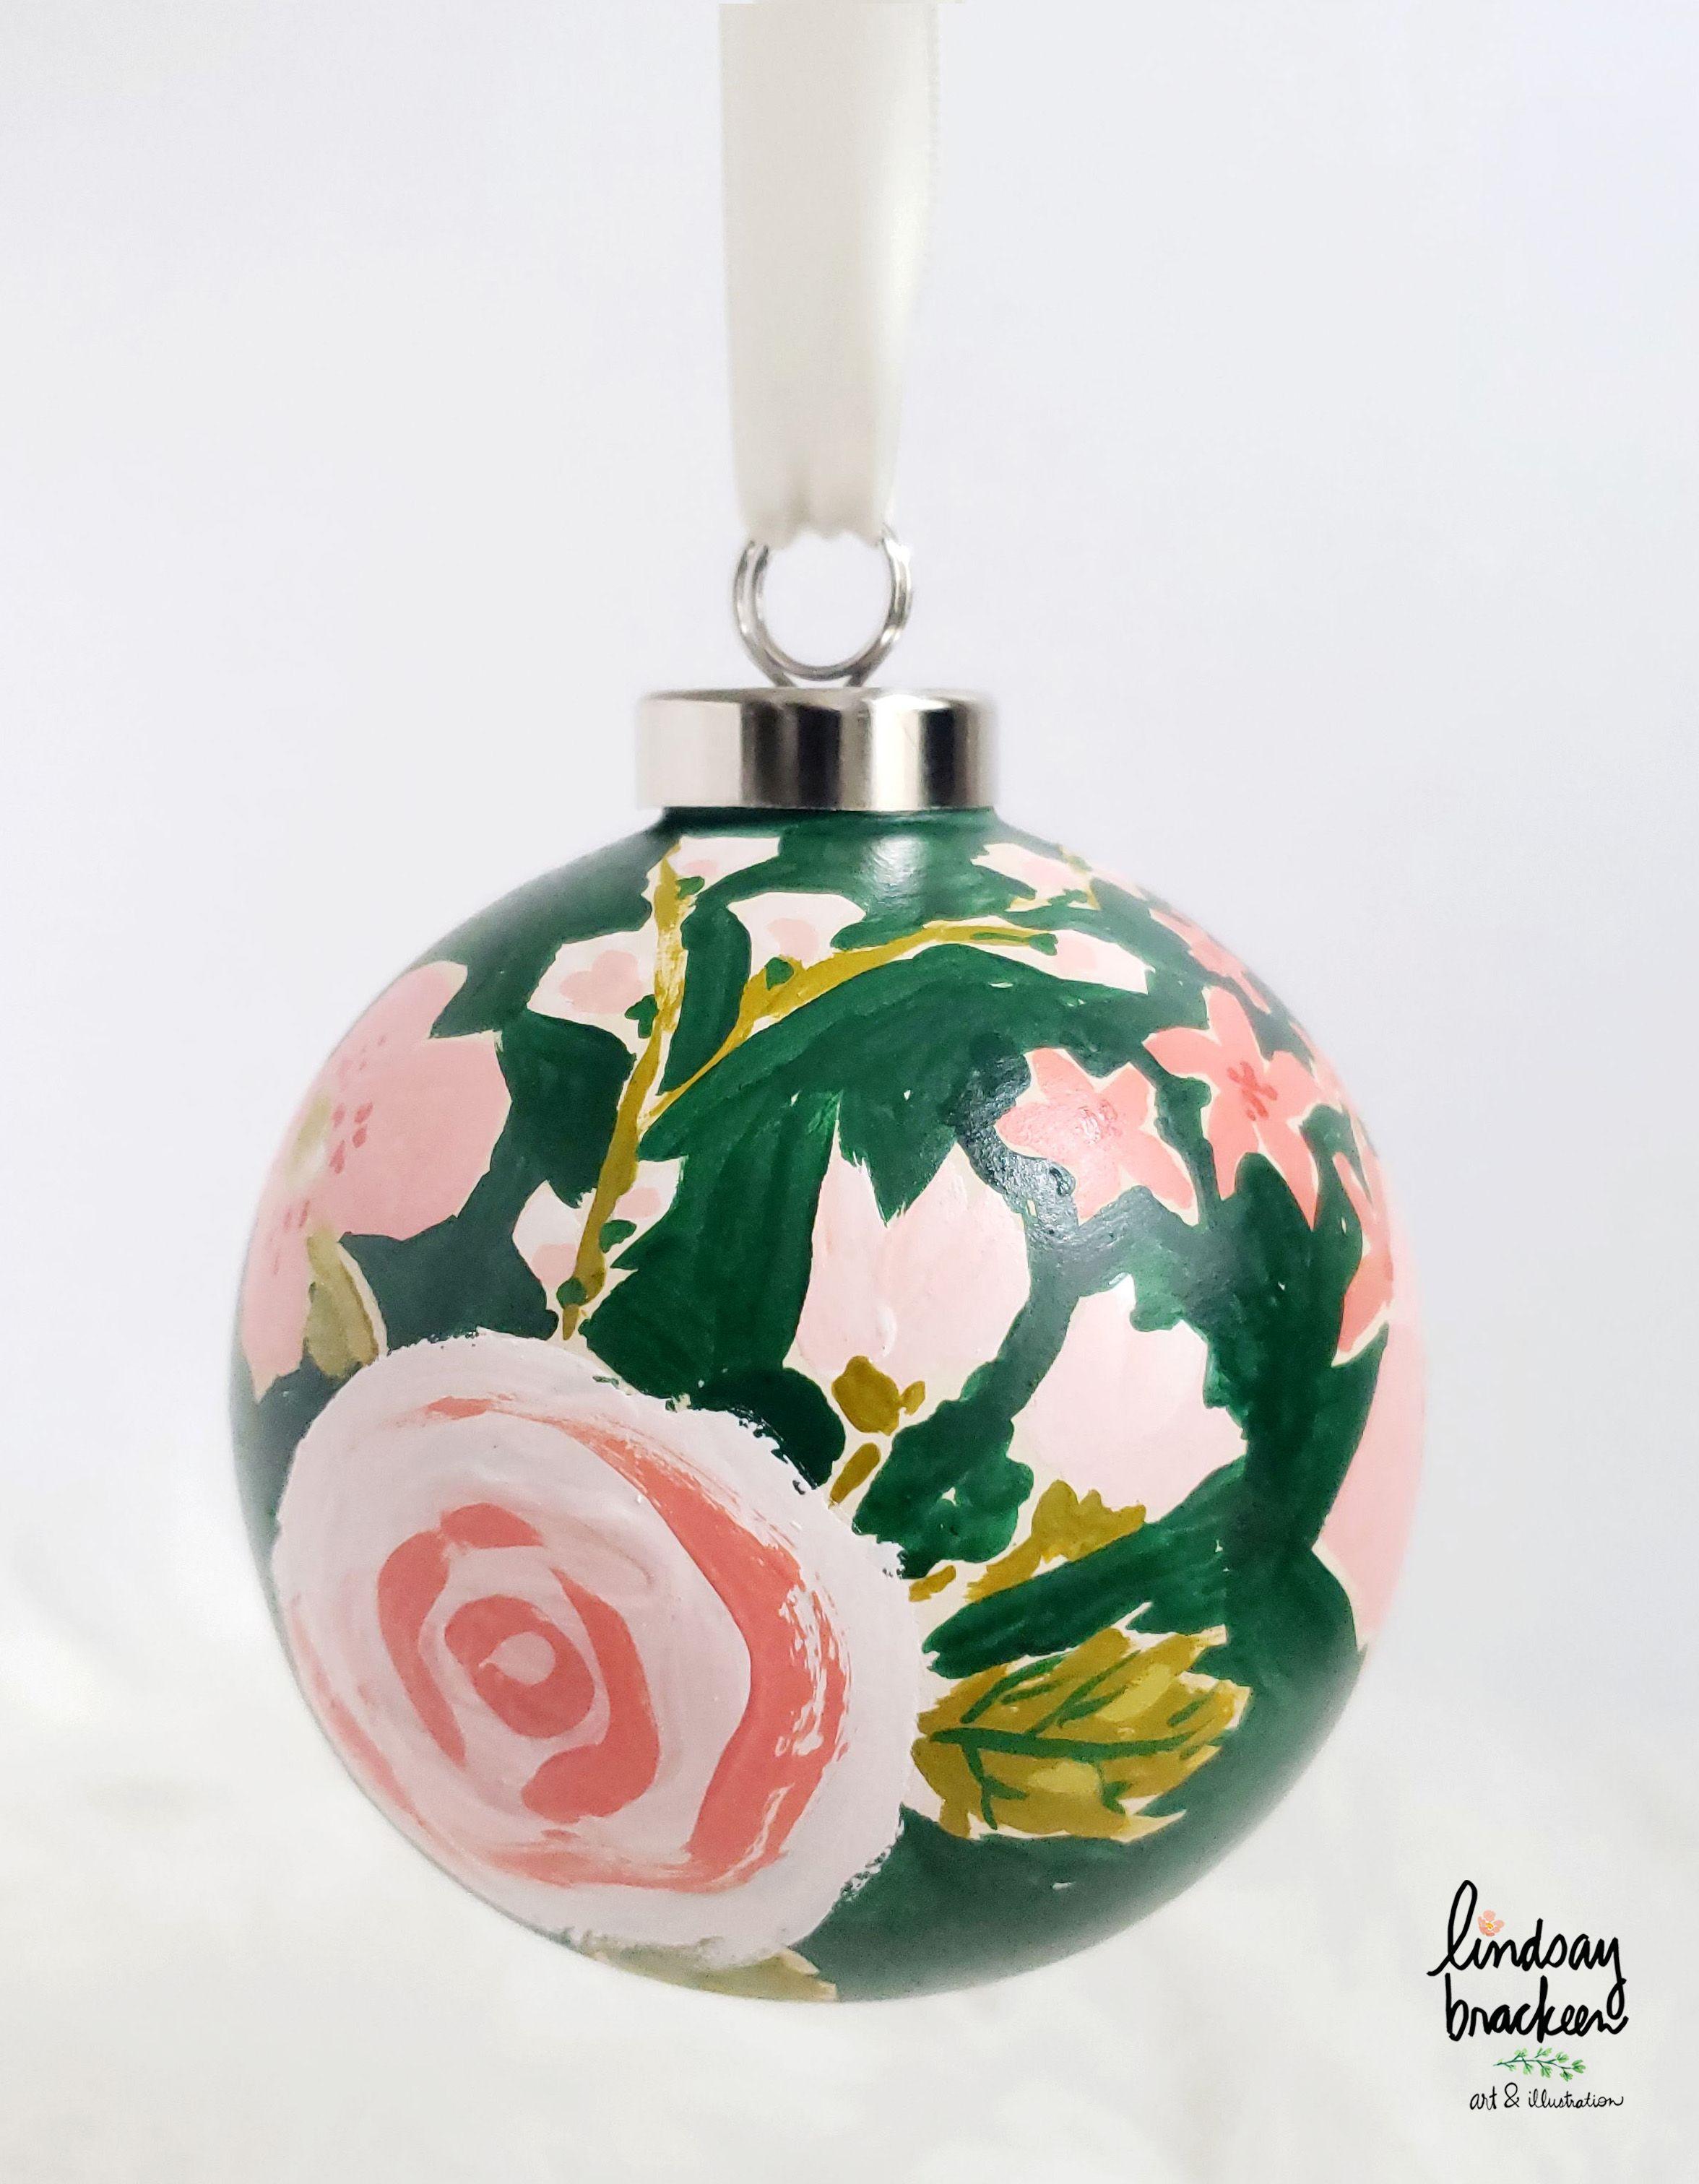 Hand Painted Ceramic Ornaments By Lindsay Brackeen Boho Christmas Decor Hand Painted Beads Christmas Ornaments